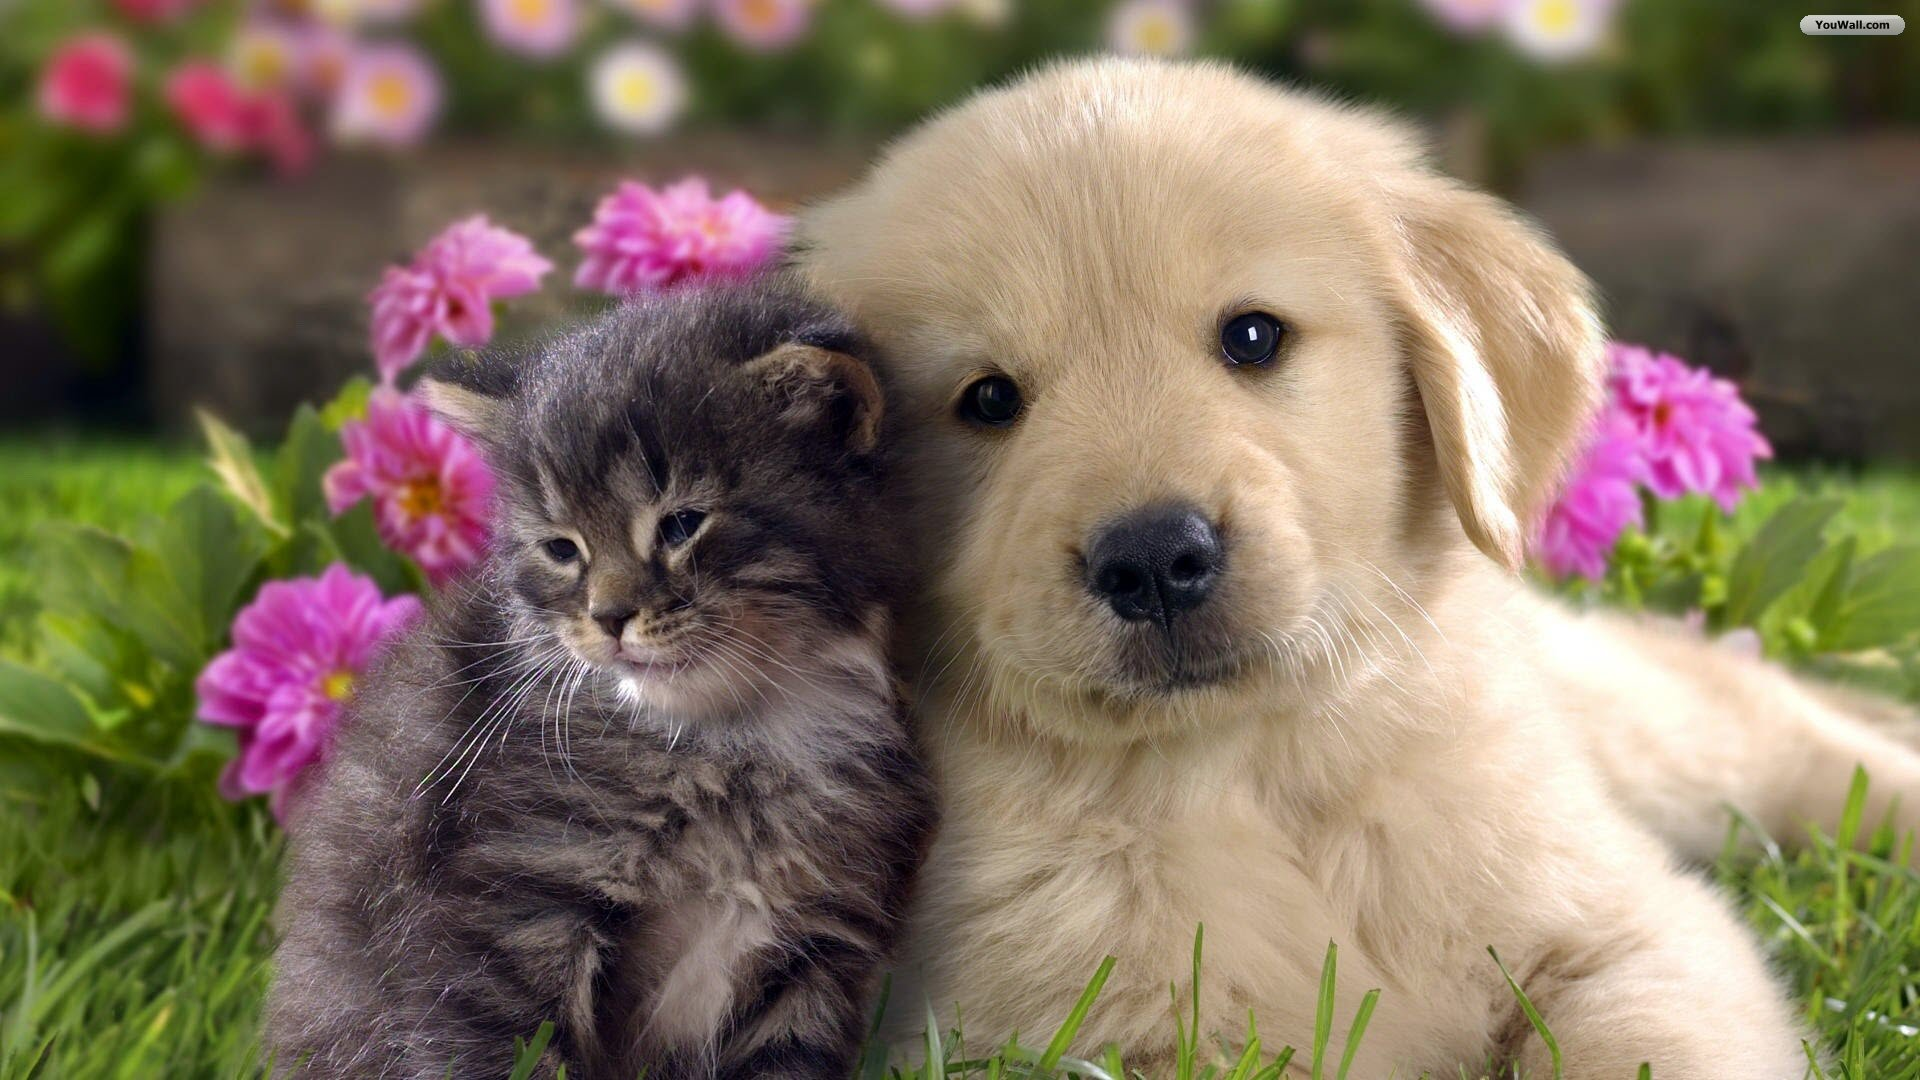 as desktop wallpaper cat and dog wallpaper 1920x1080 294 kb 1920x1080